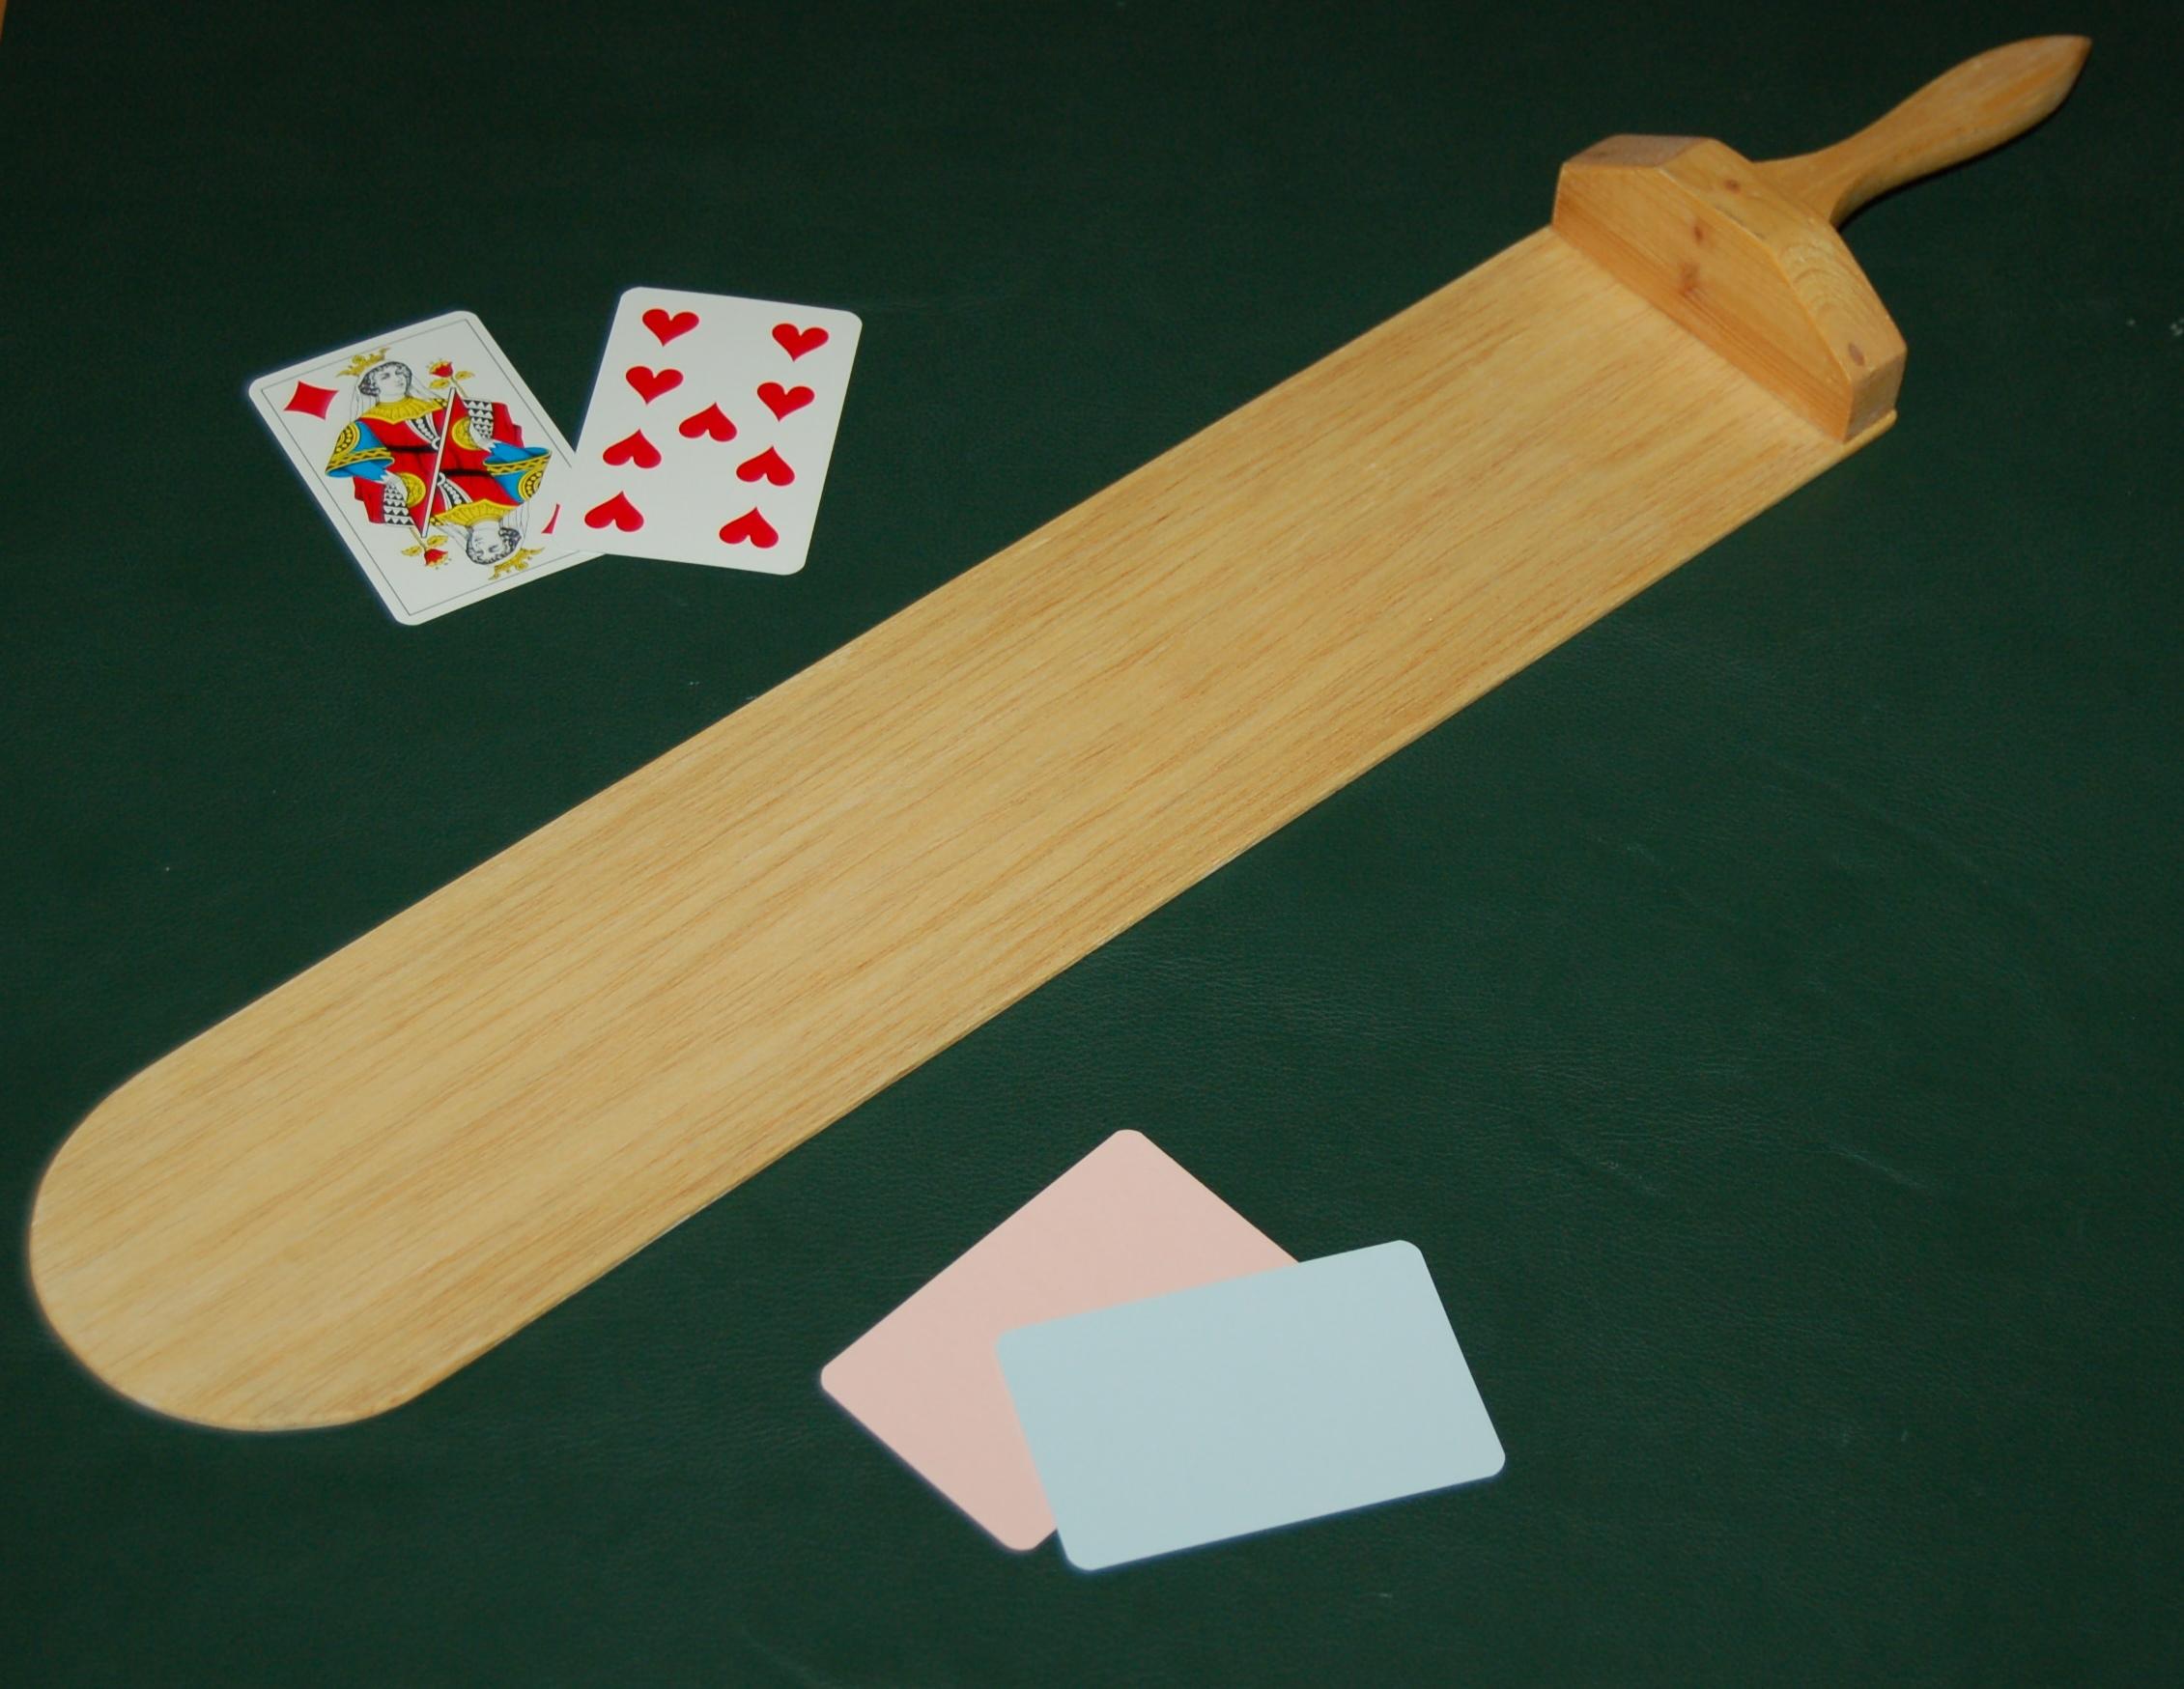 Baccarat (card game) - Wikipedia